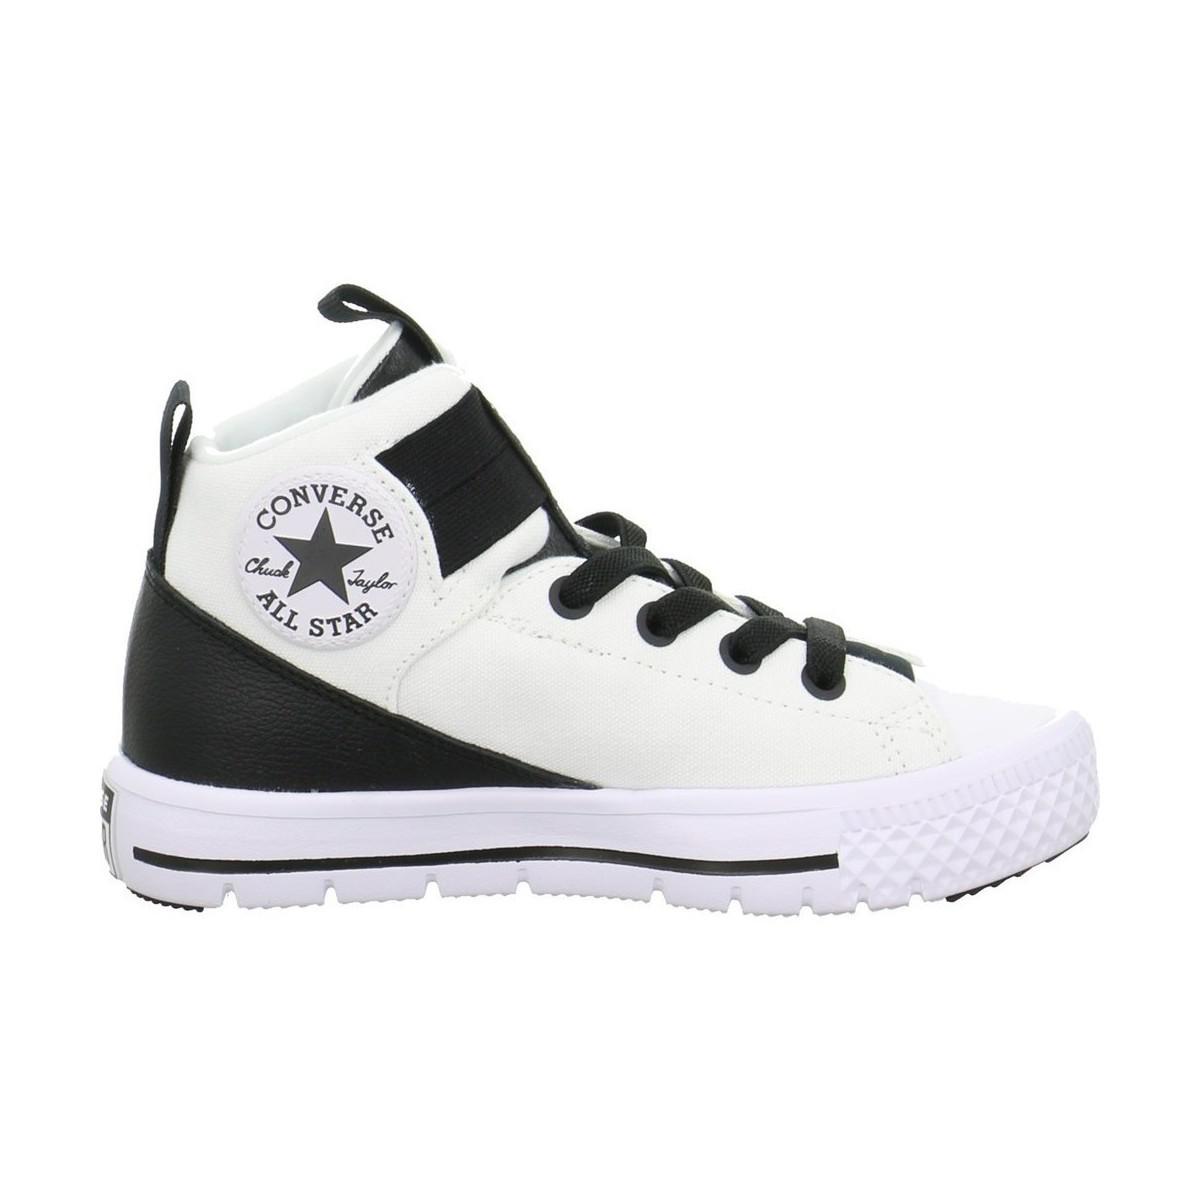 f3a3e0301e86 Converse Ct As High Street Lite Hi Men s Shoes (high-top Trainers ...